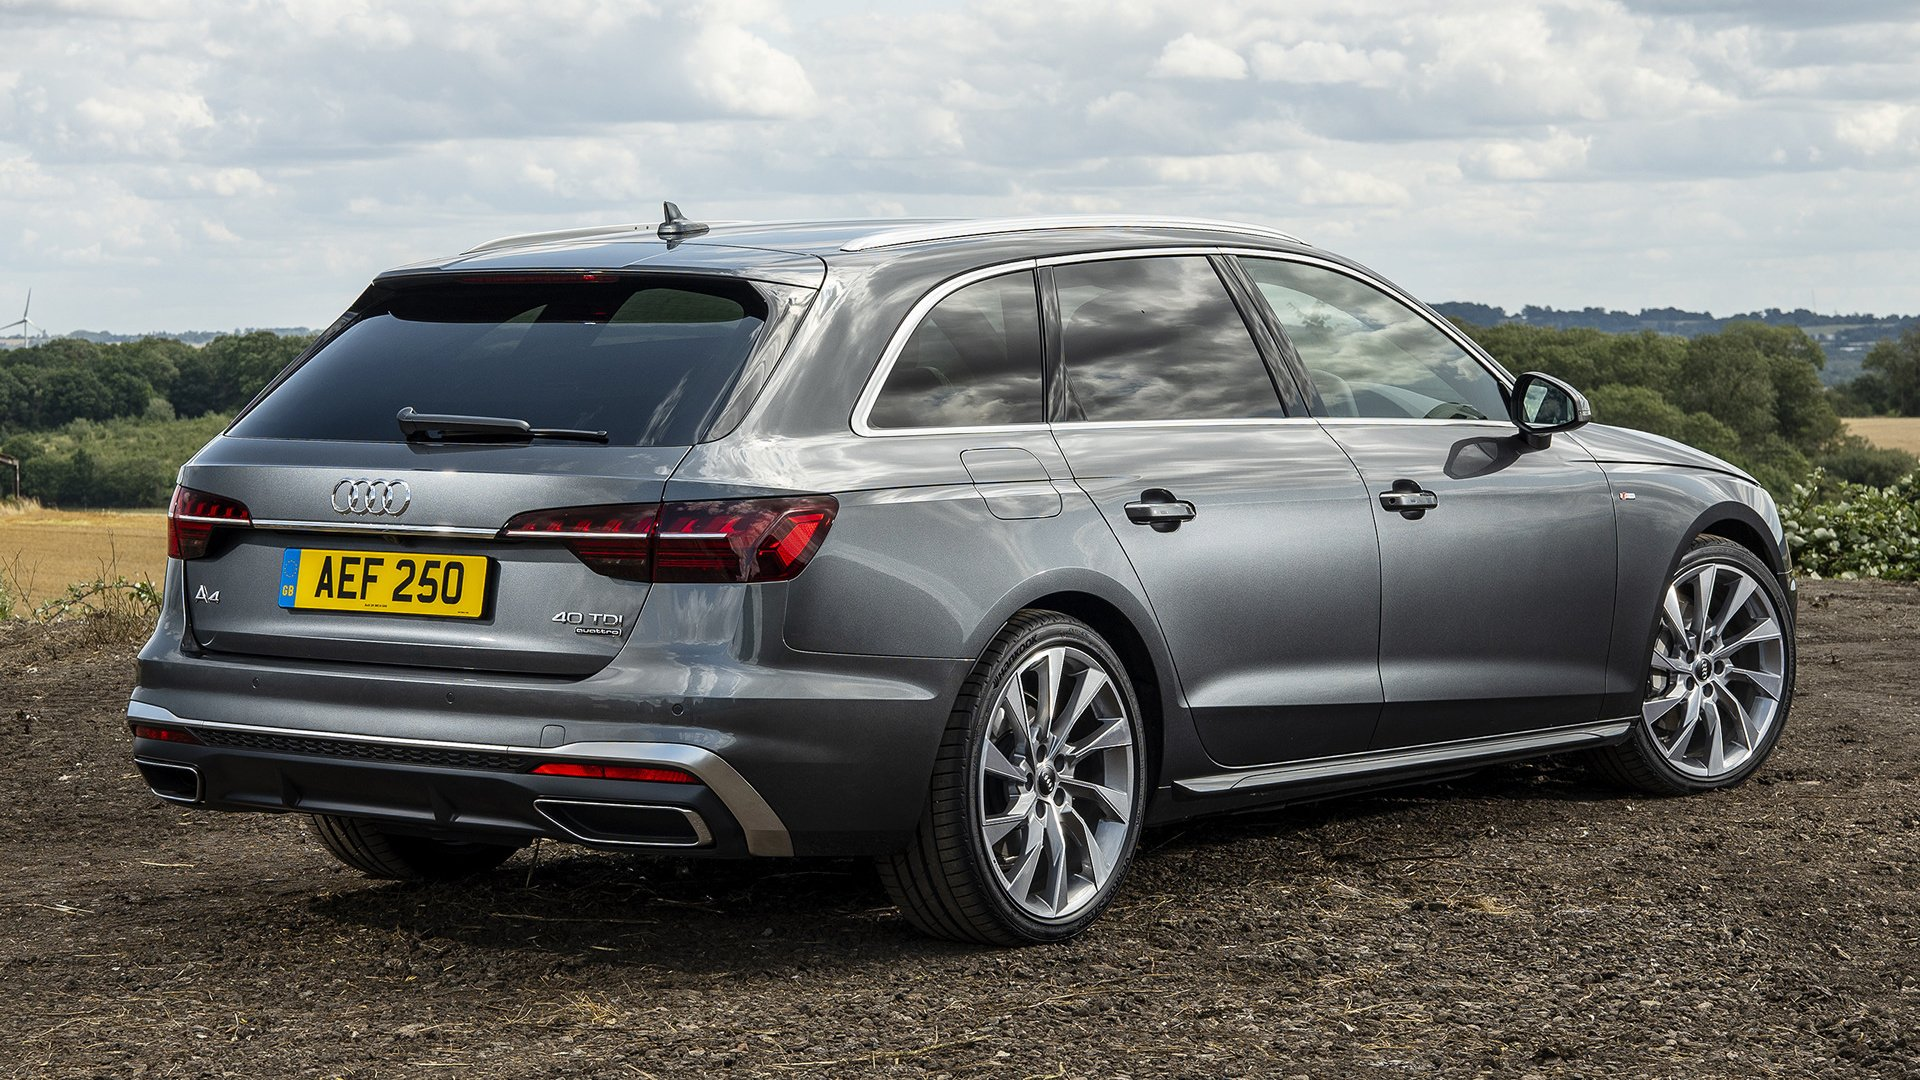 2019 Audi A4 Avant S Line Hd Wallpaper Background Image